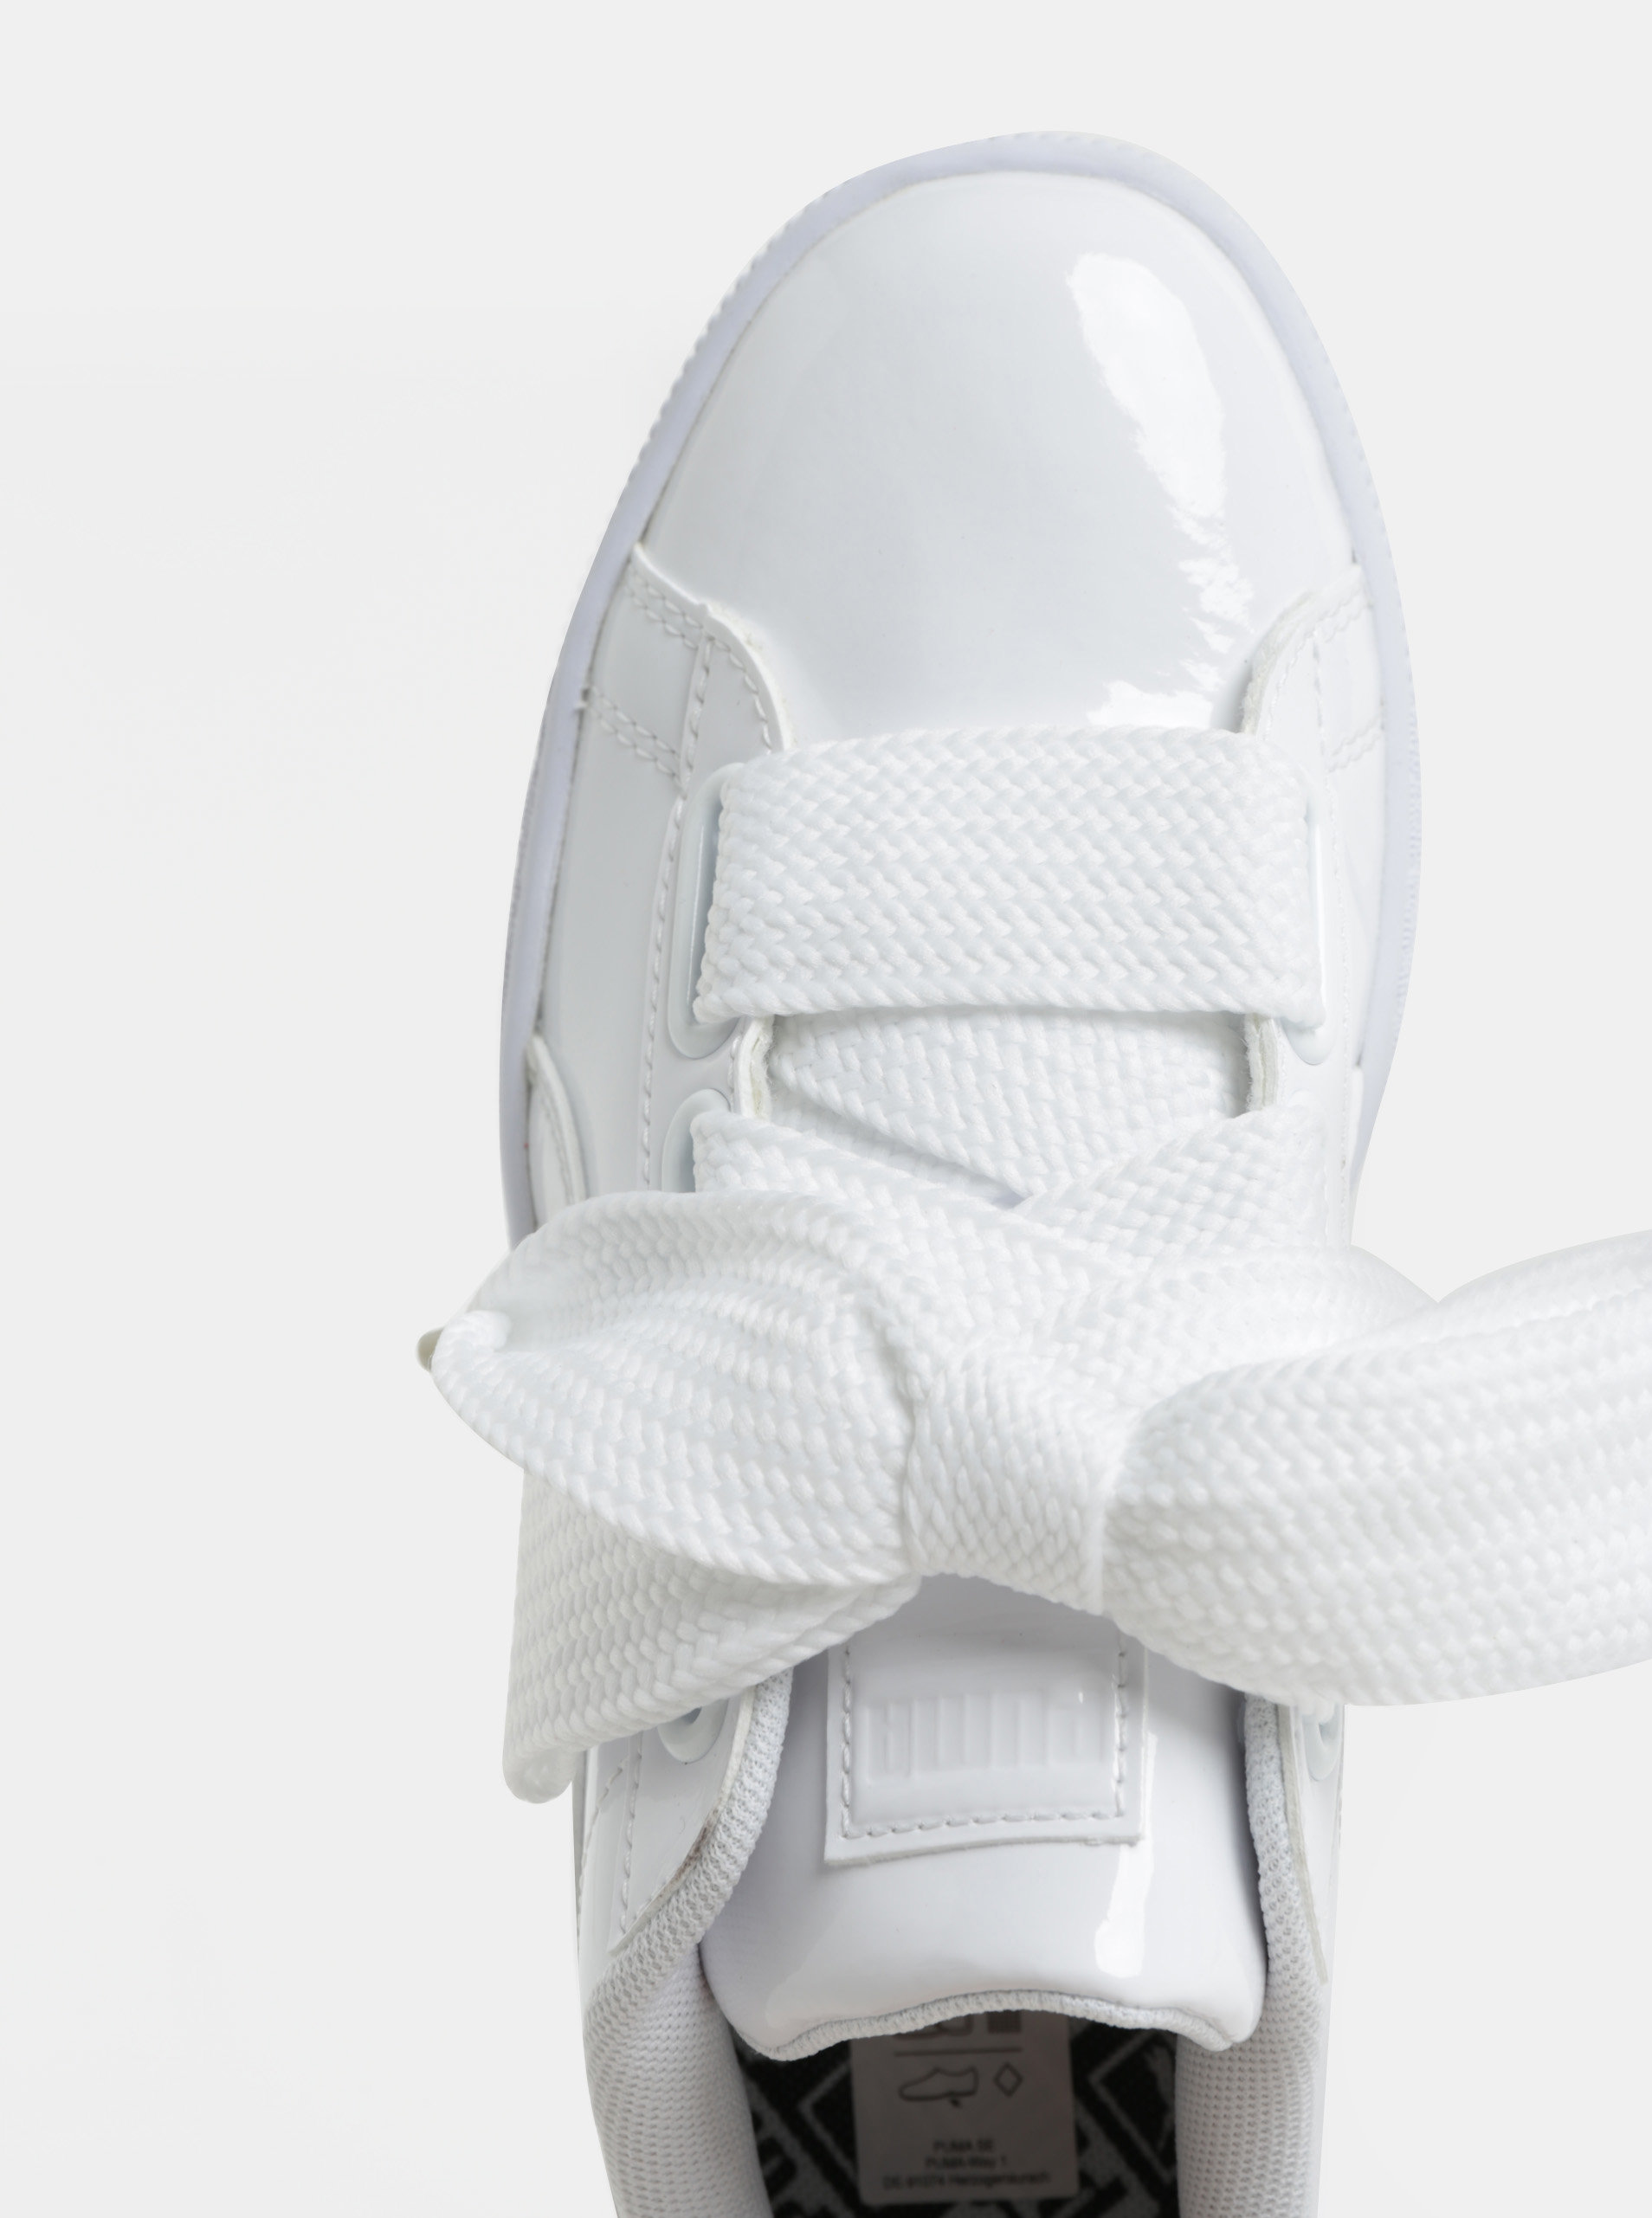 50a745c3d9c2d Biele dámske lesklé tenisky so širokými šnúrkami Puma Basket Heart ...